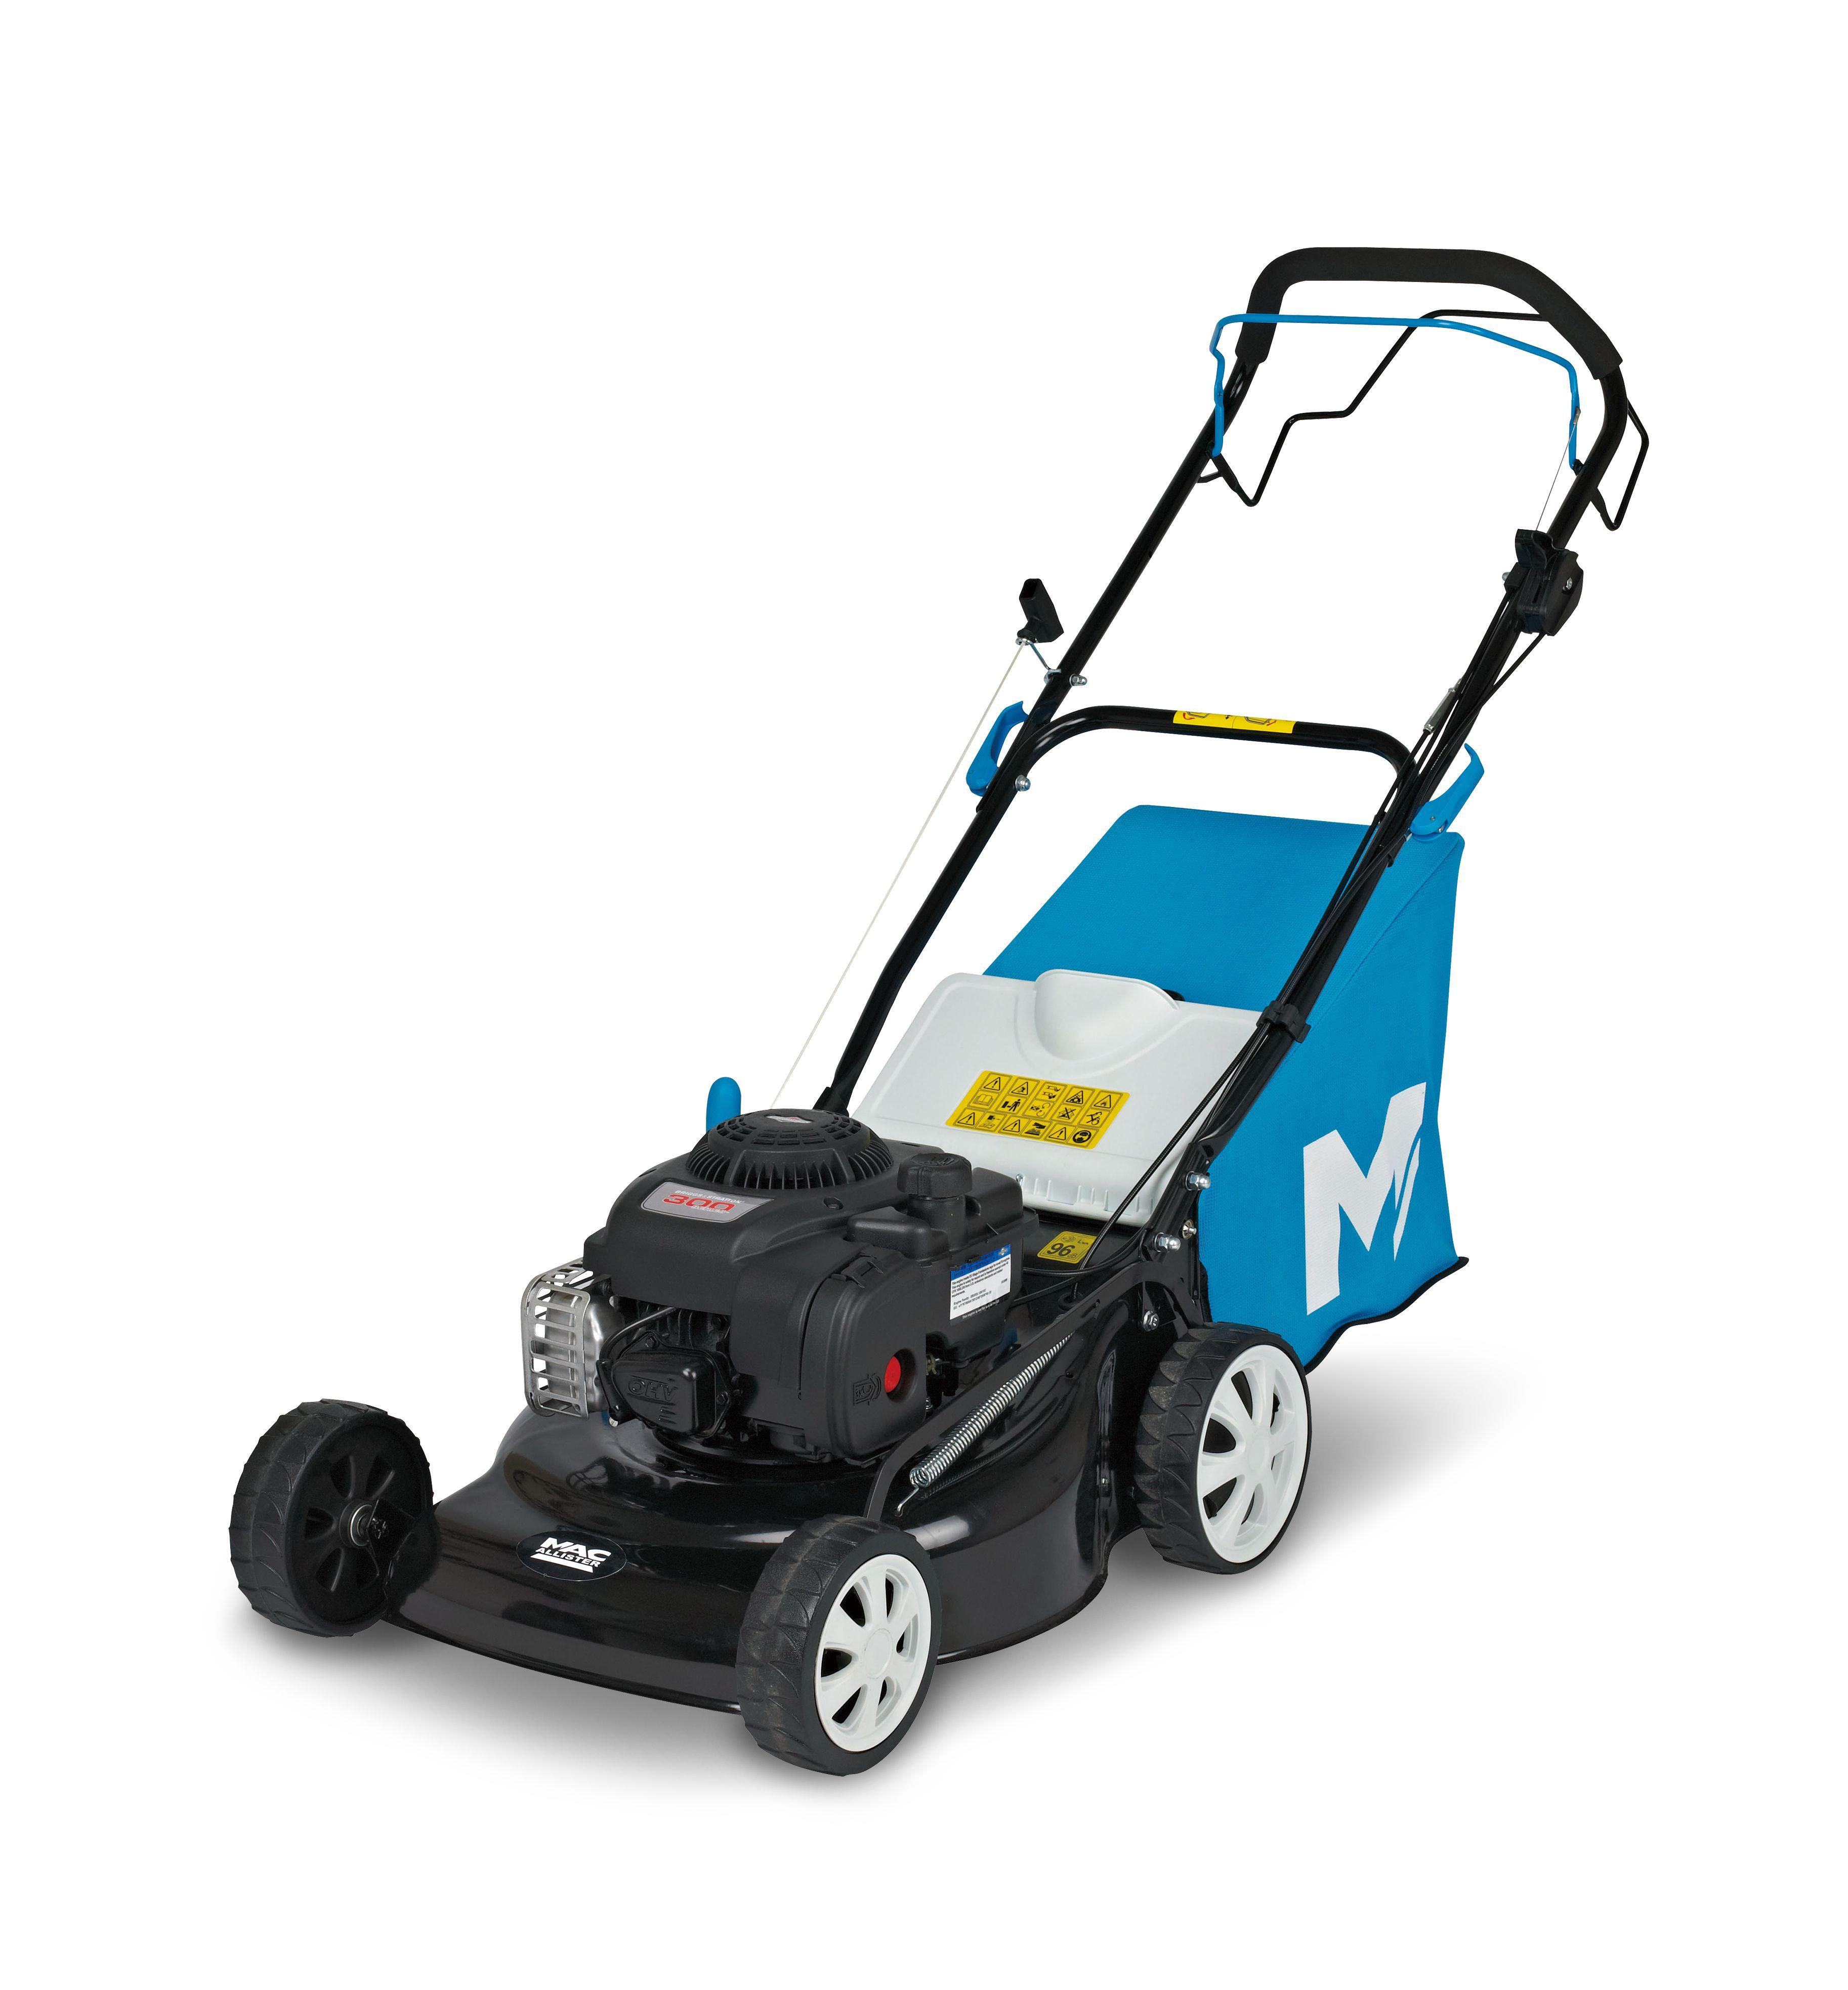 mac allister 125 cc 460mm petrol lawnmower departments. Black Bedroom Furniture Sets. Home Design Ideas